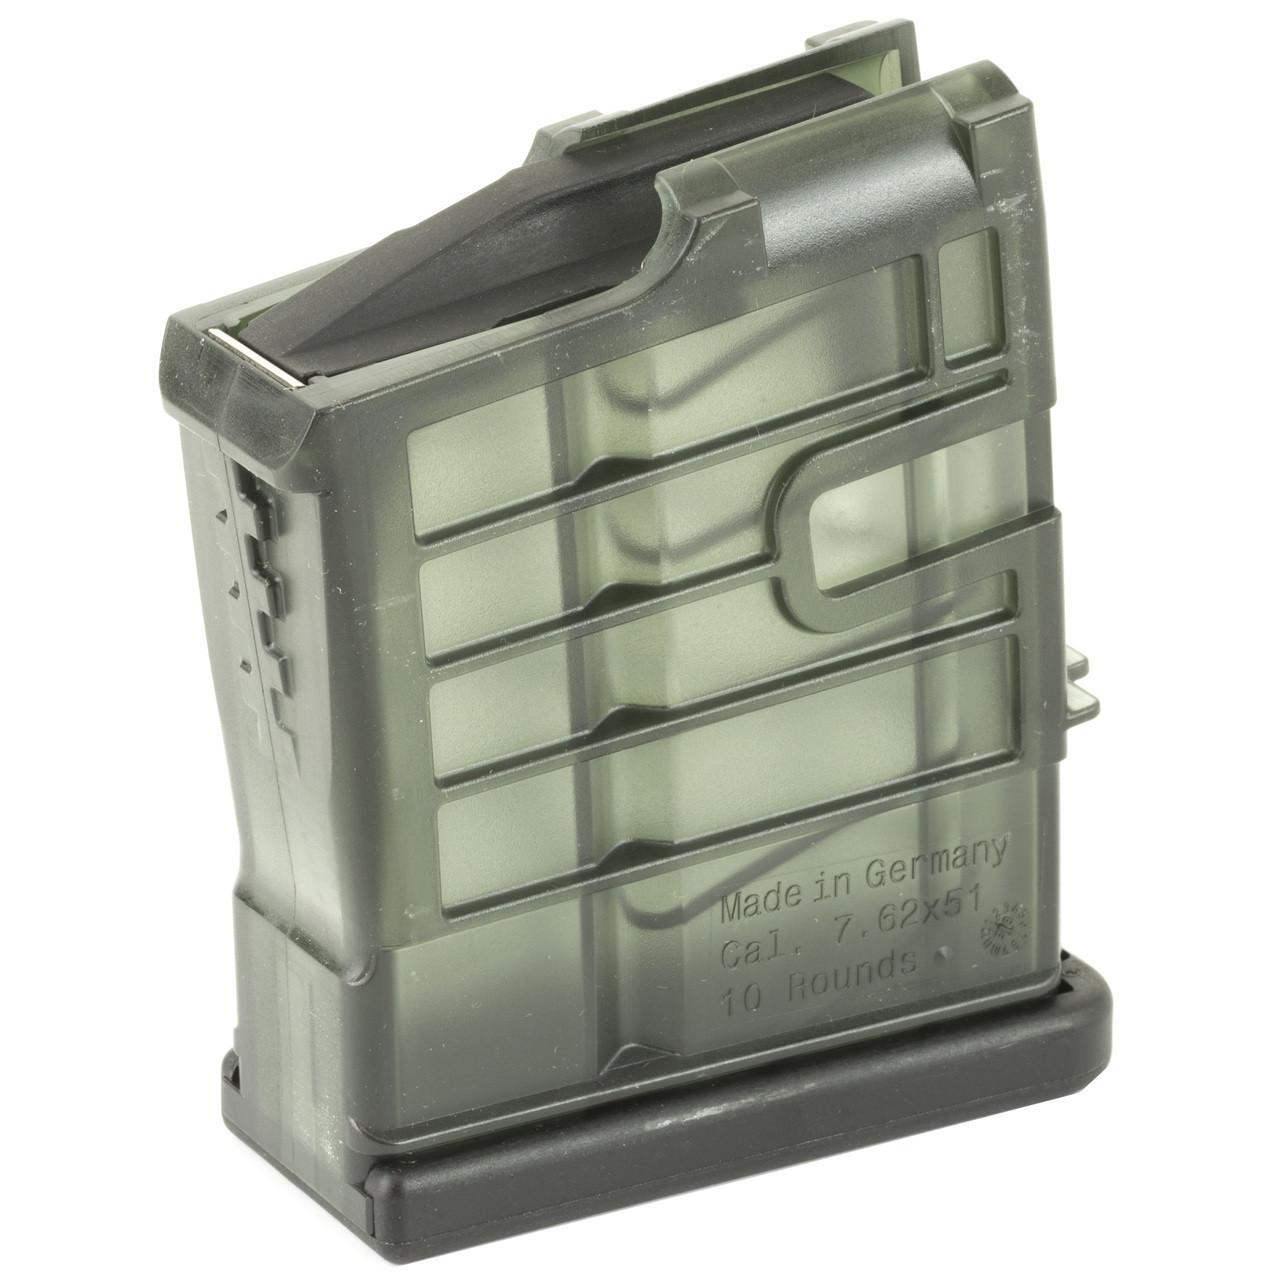 HK MR762  308 7 62mm 10rd Polymer Magazines